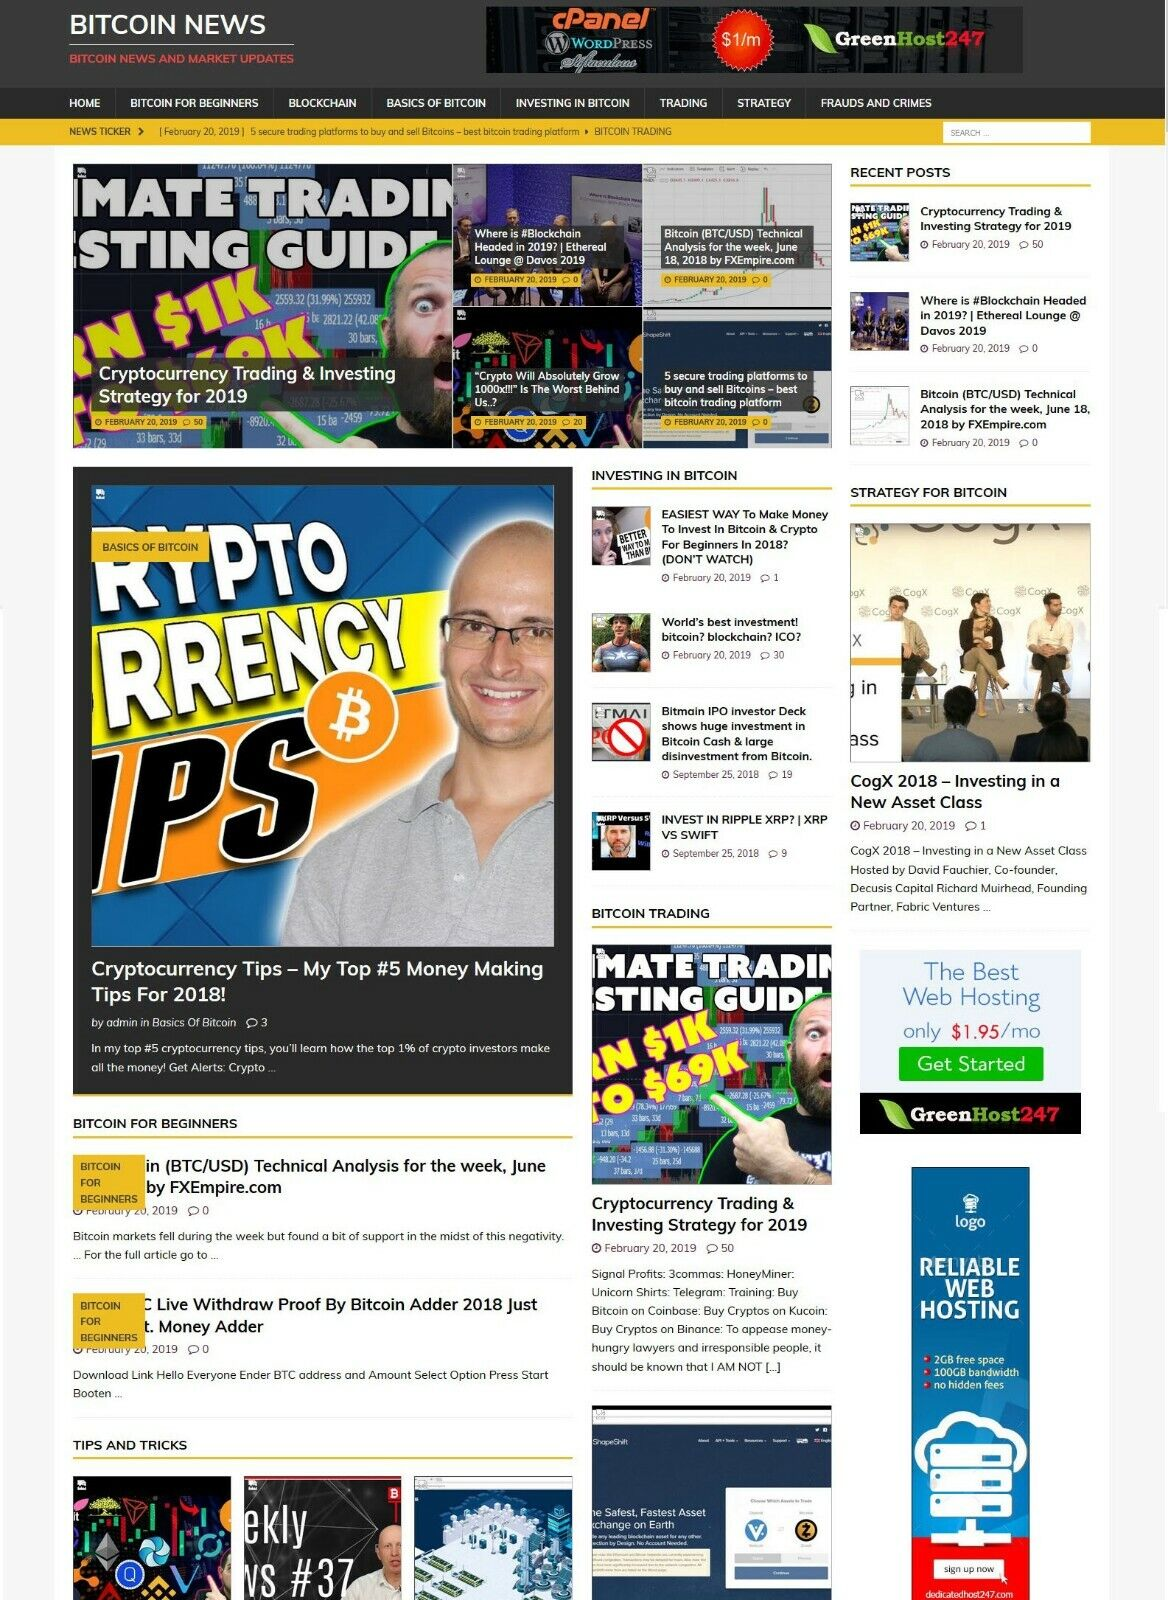 Bit coin News Website - Runs on AutoPilot + Free Install + Hosting 1